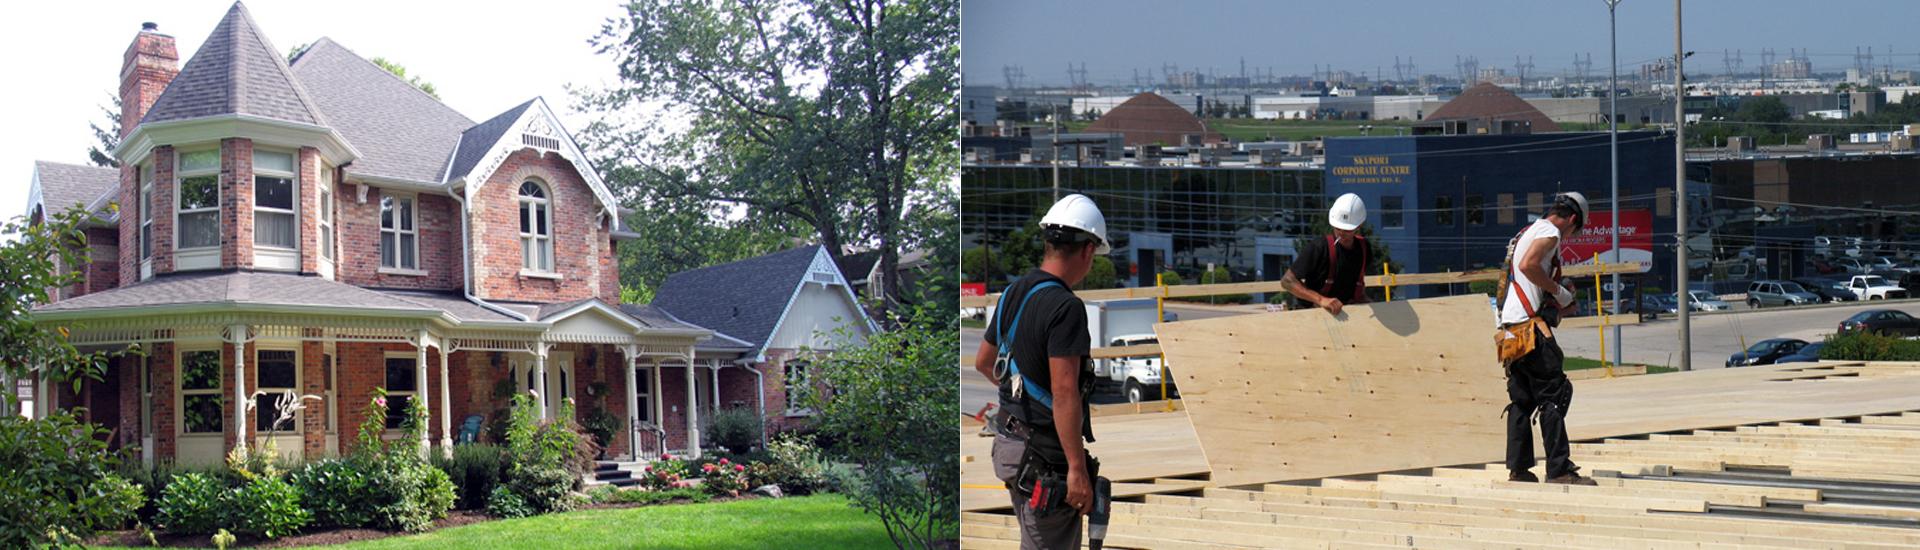 Milton Roofing Installations Repairs